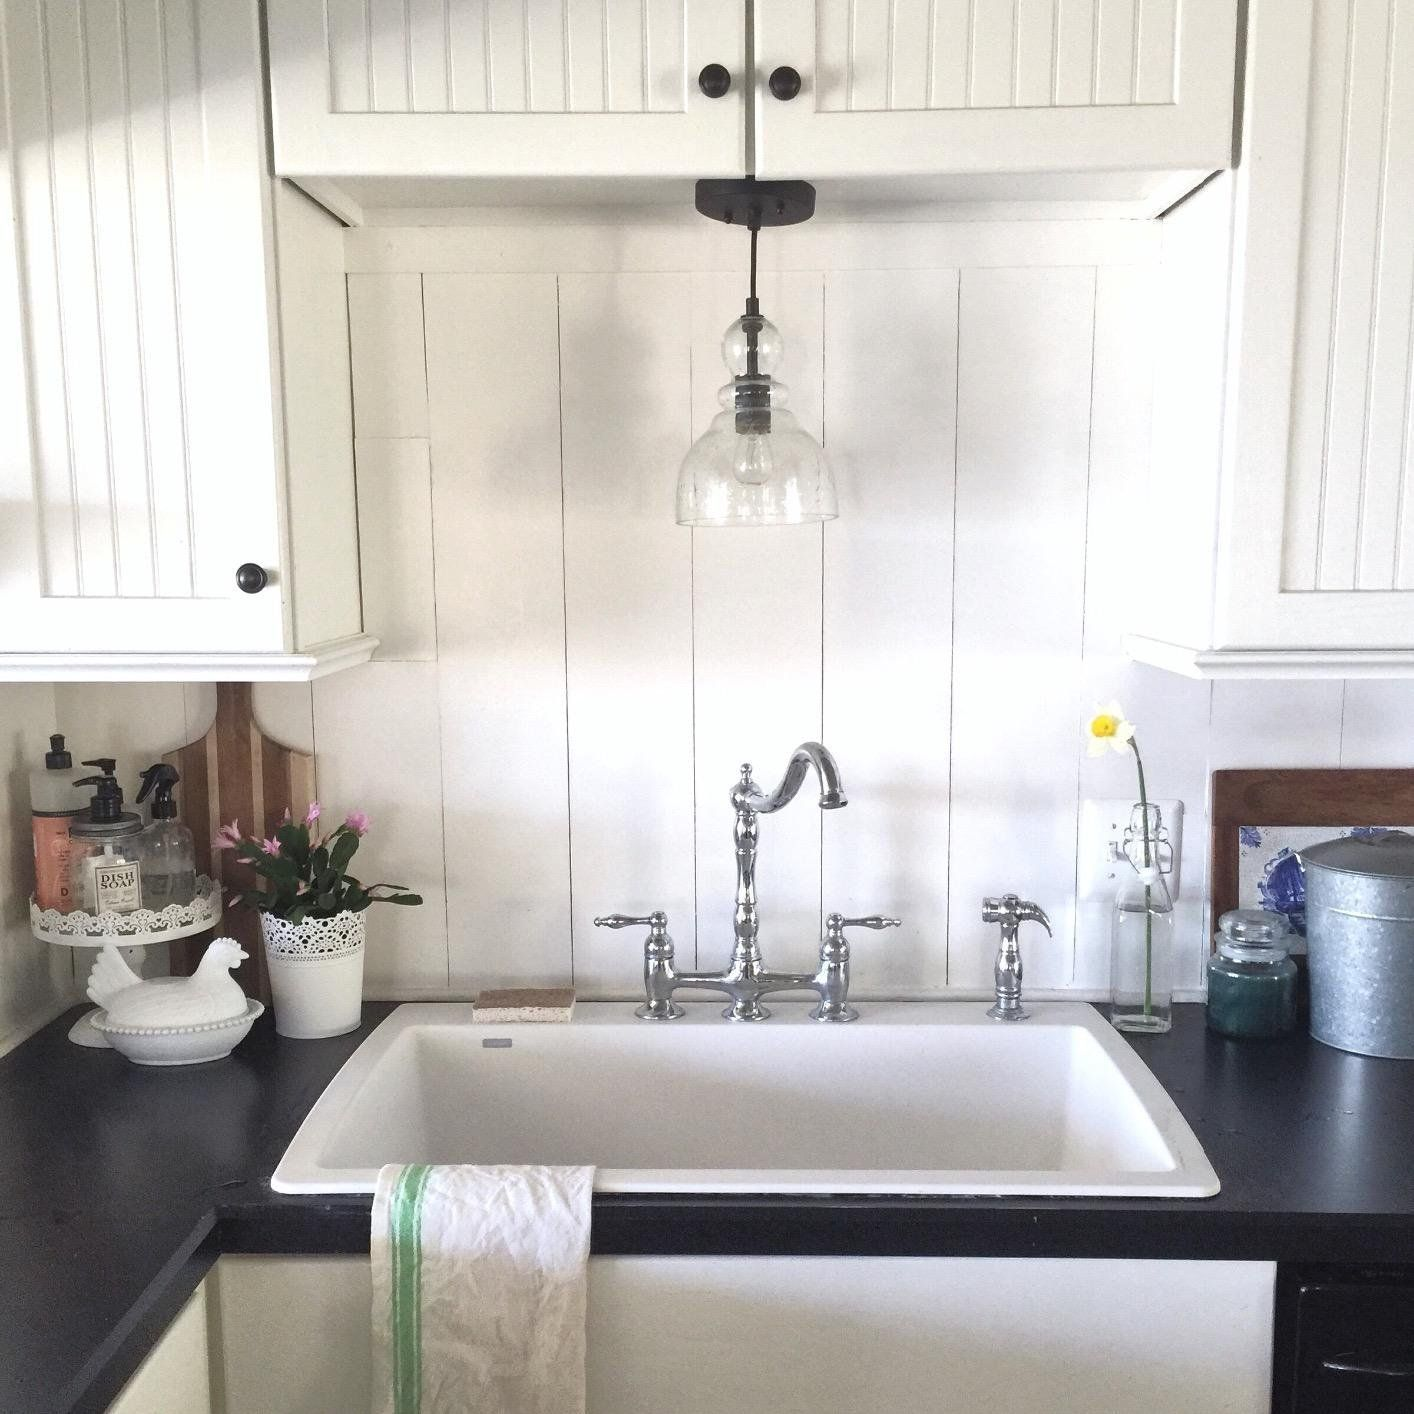 Blanco 511-651 Diamond Super Single Bowl Kitchen Sink White Finish